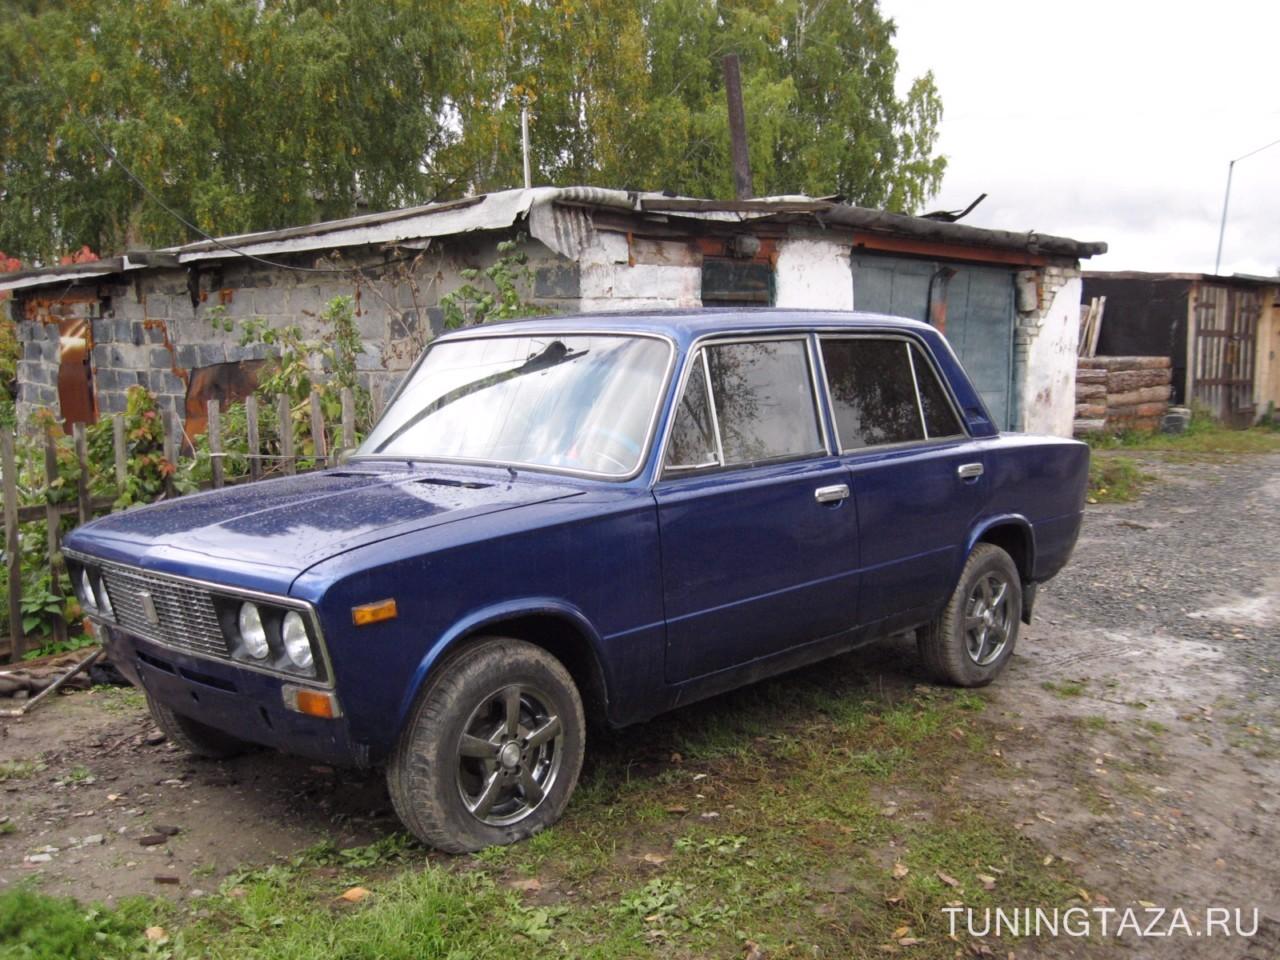 Детали и тюнинг ВАЗ 2106